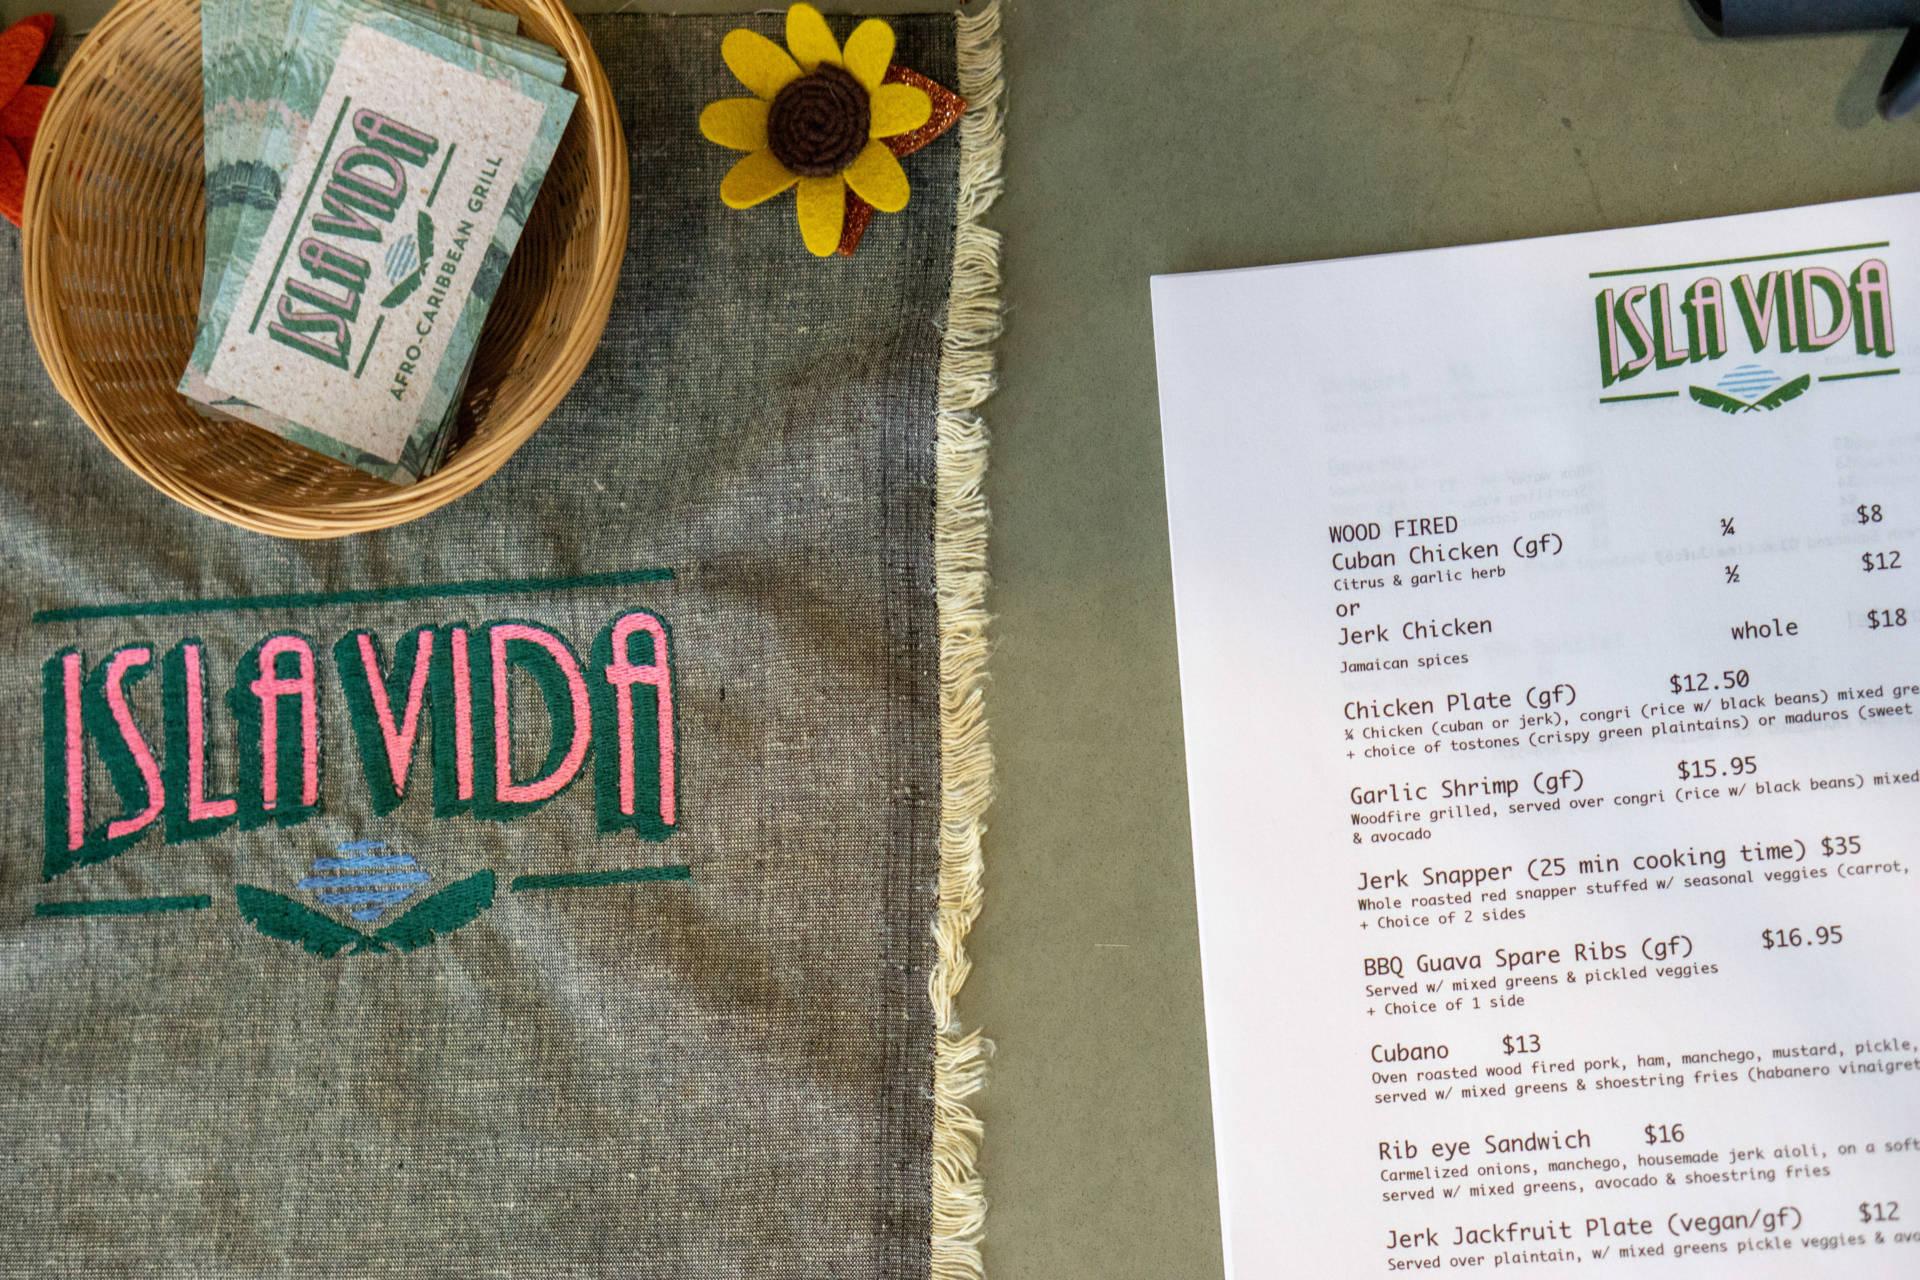 The menu at Isla Vida is small, but mighty.